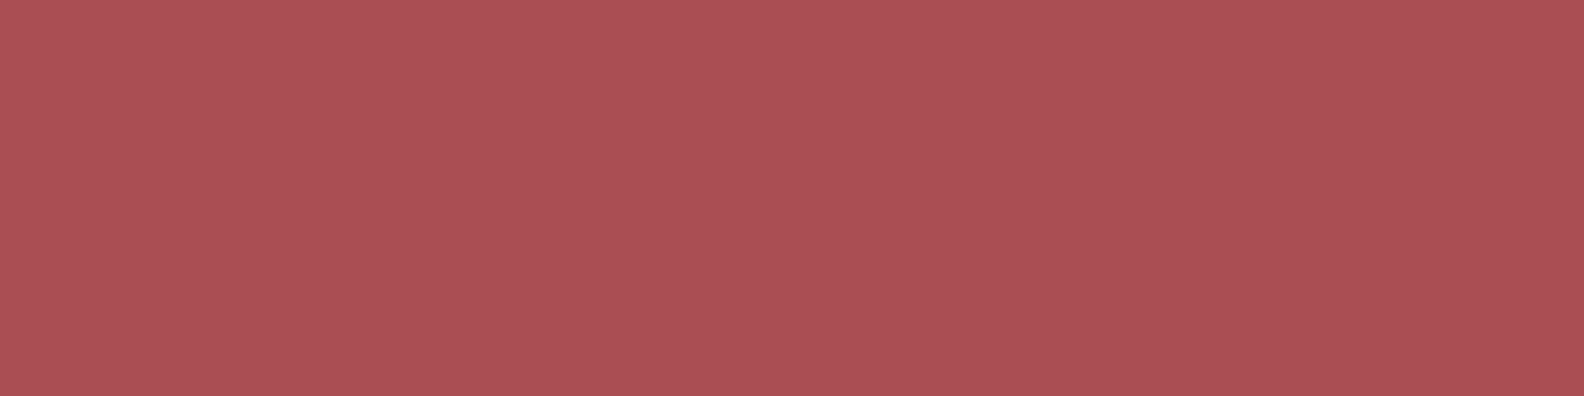 1584x396 Rose Vale Solid Color Background